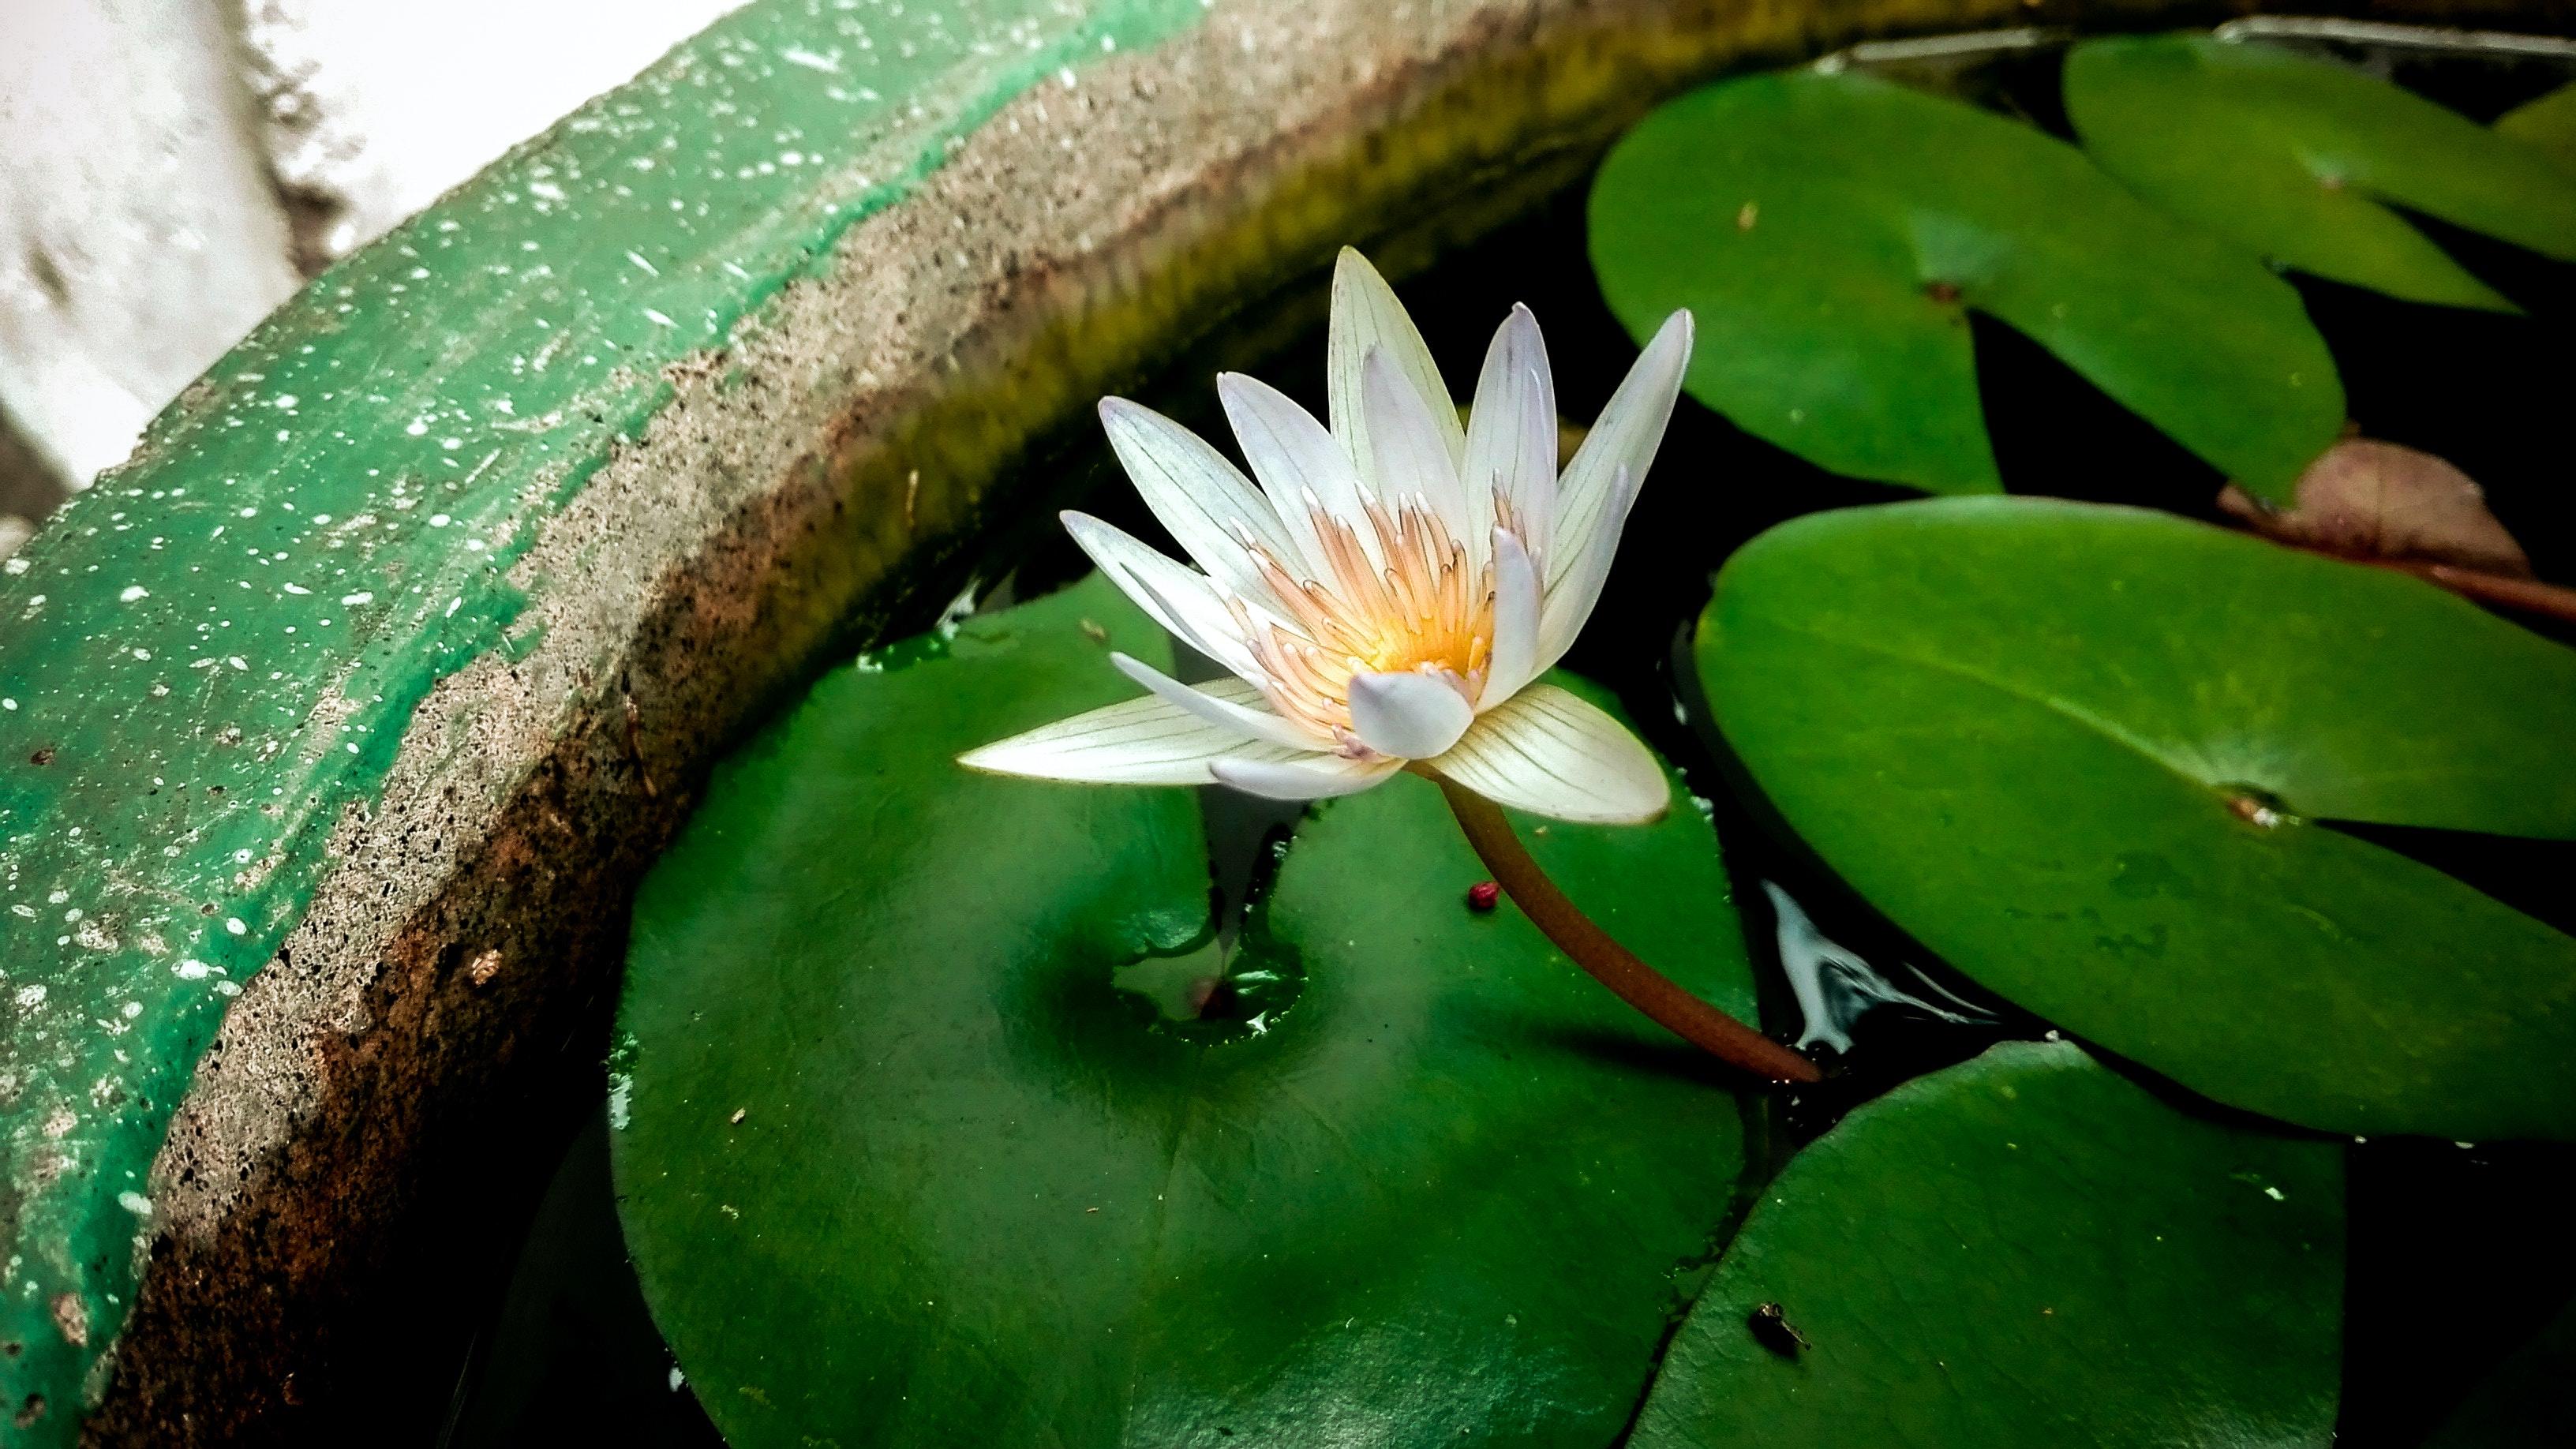 Unduh 7600 Koleksi Gambar Bunga Bakung Yang Indah HD Paling